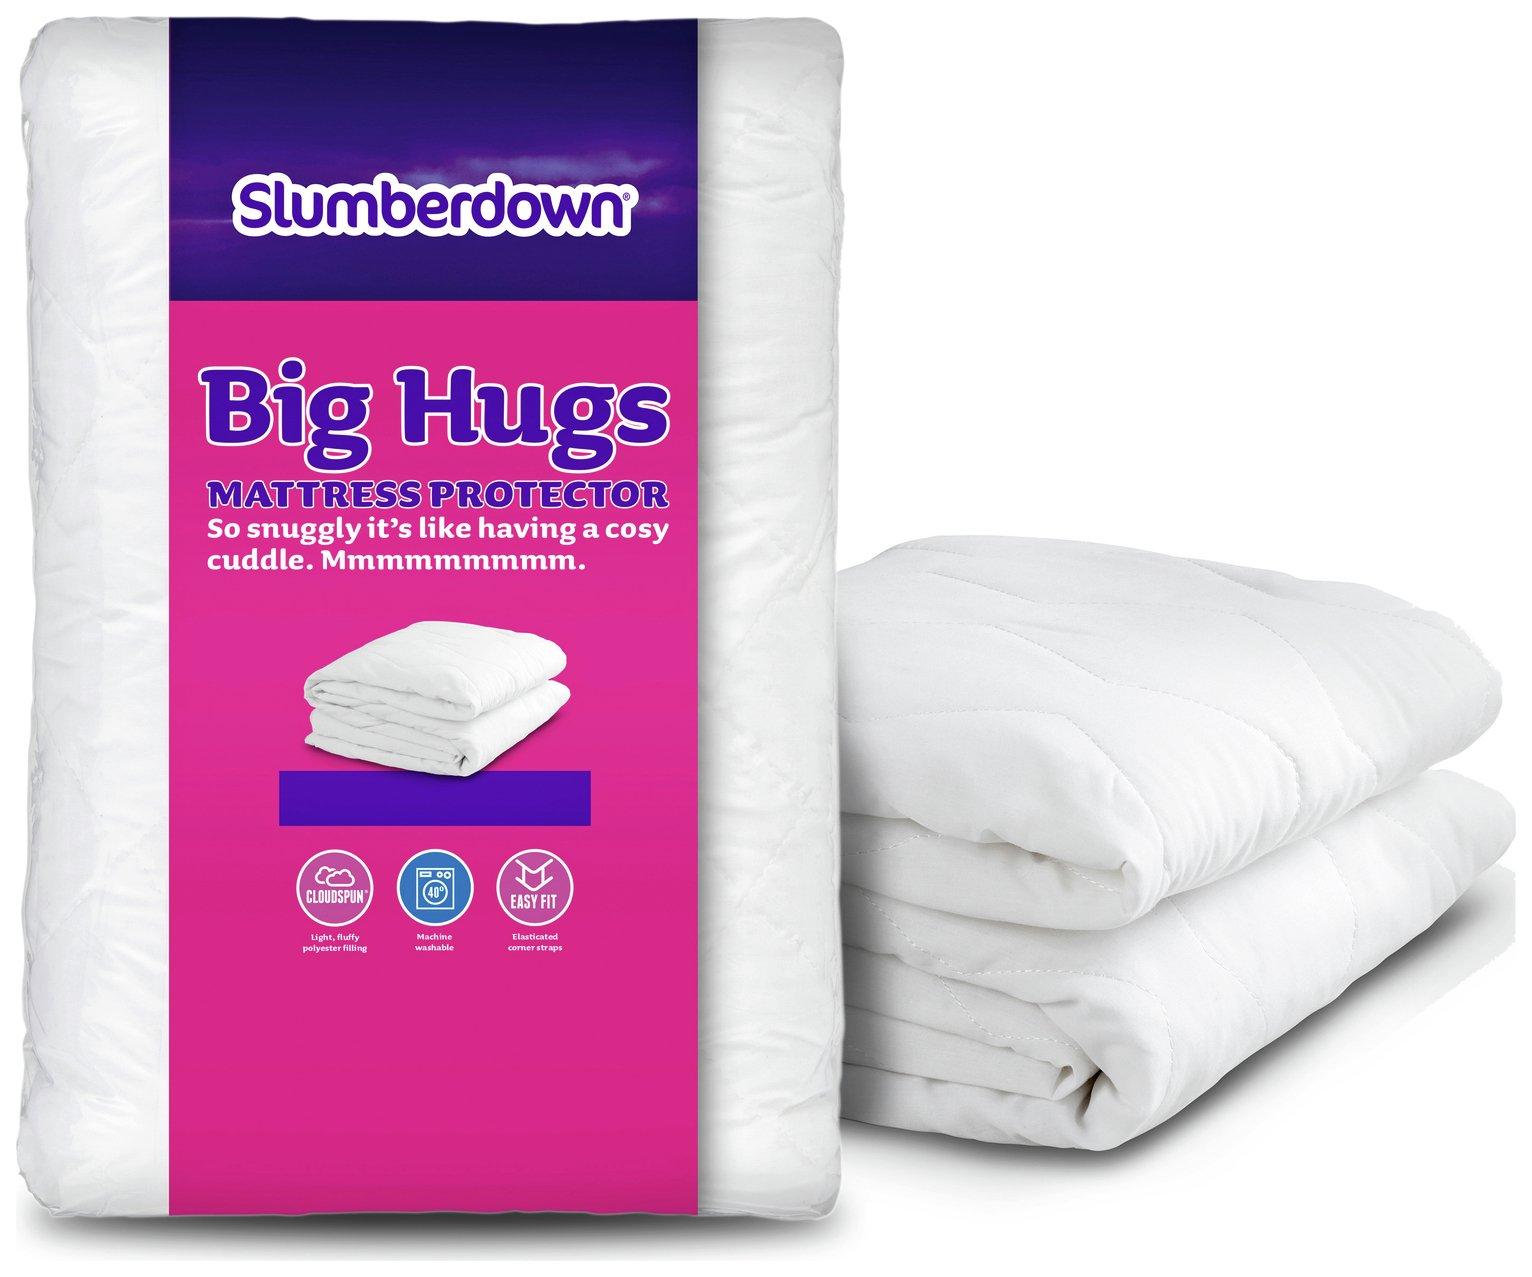 slumberdown  big hugs  mattress protector  single